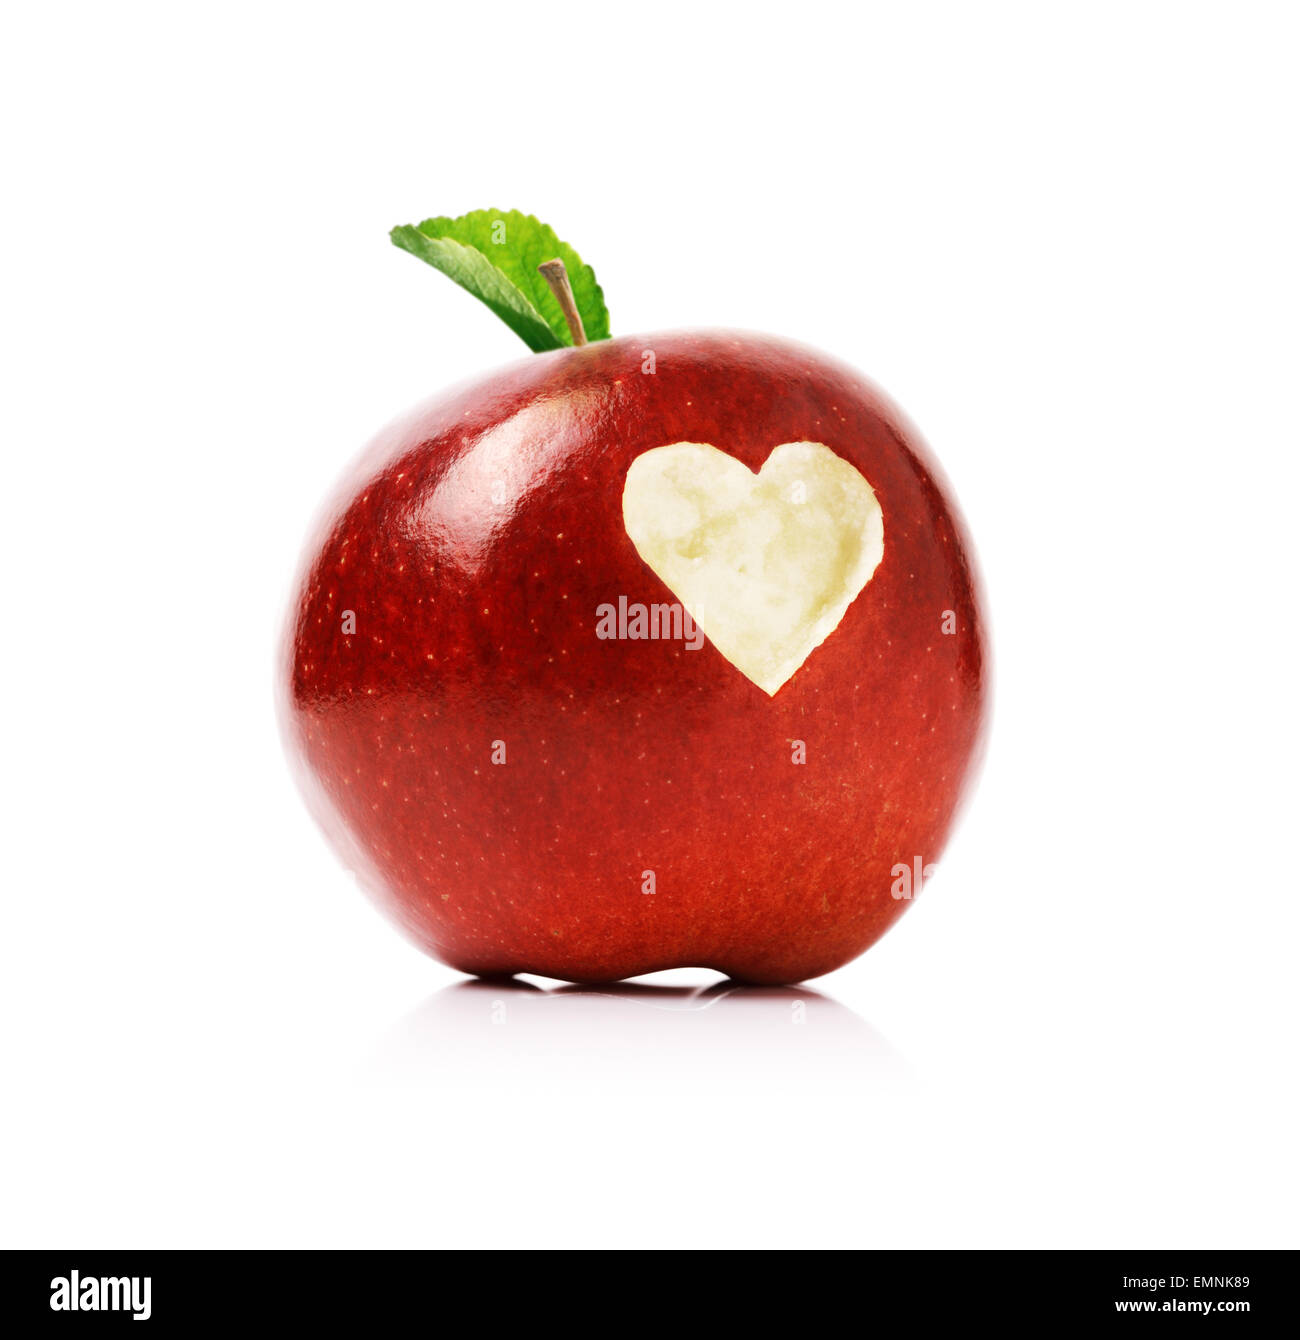 forbidden apple stock photos forbidden apple stock. Black Bedroom Furniture Sets. Home Design Ideas